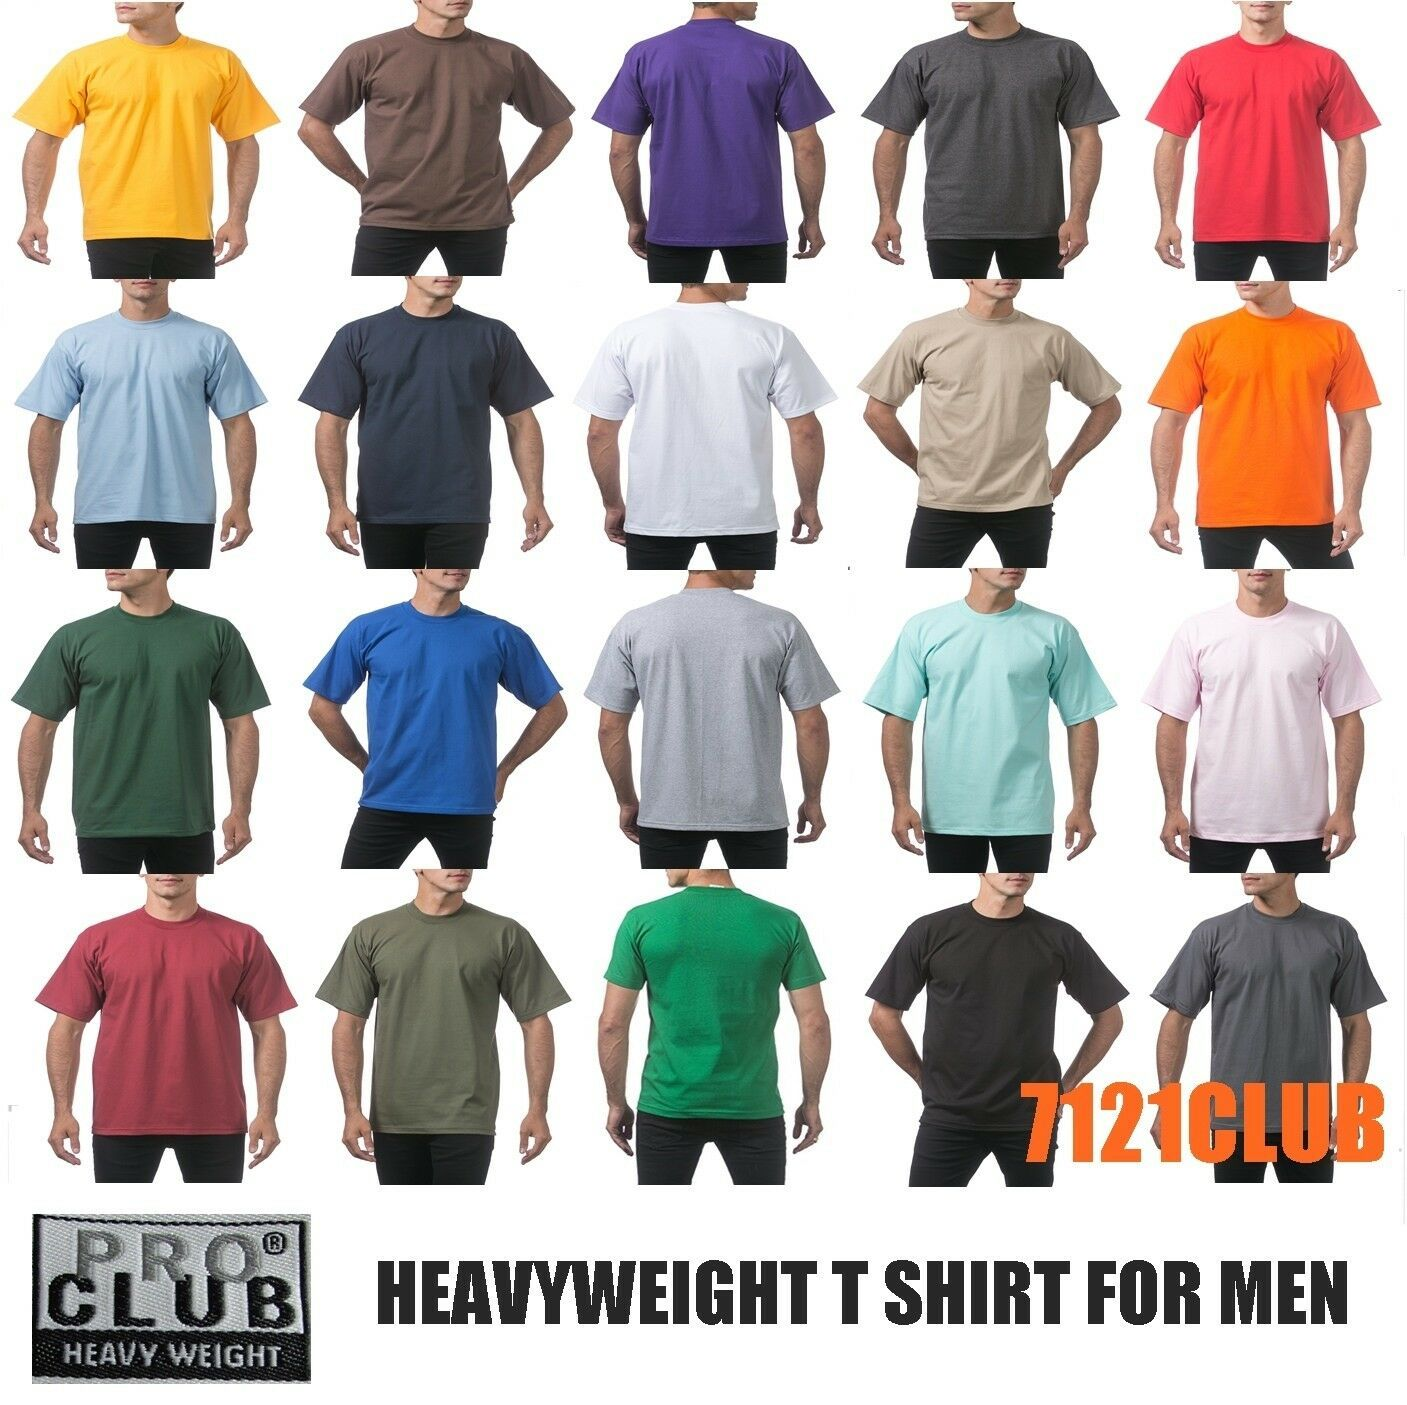 PRO CLUB MENS HEAVYWEIGHT V NECK T SHIRT PROCLUB SHORT SLEEVE WHITE BIG AND TALL